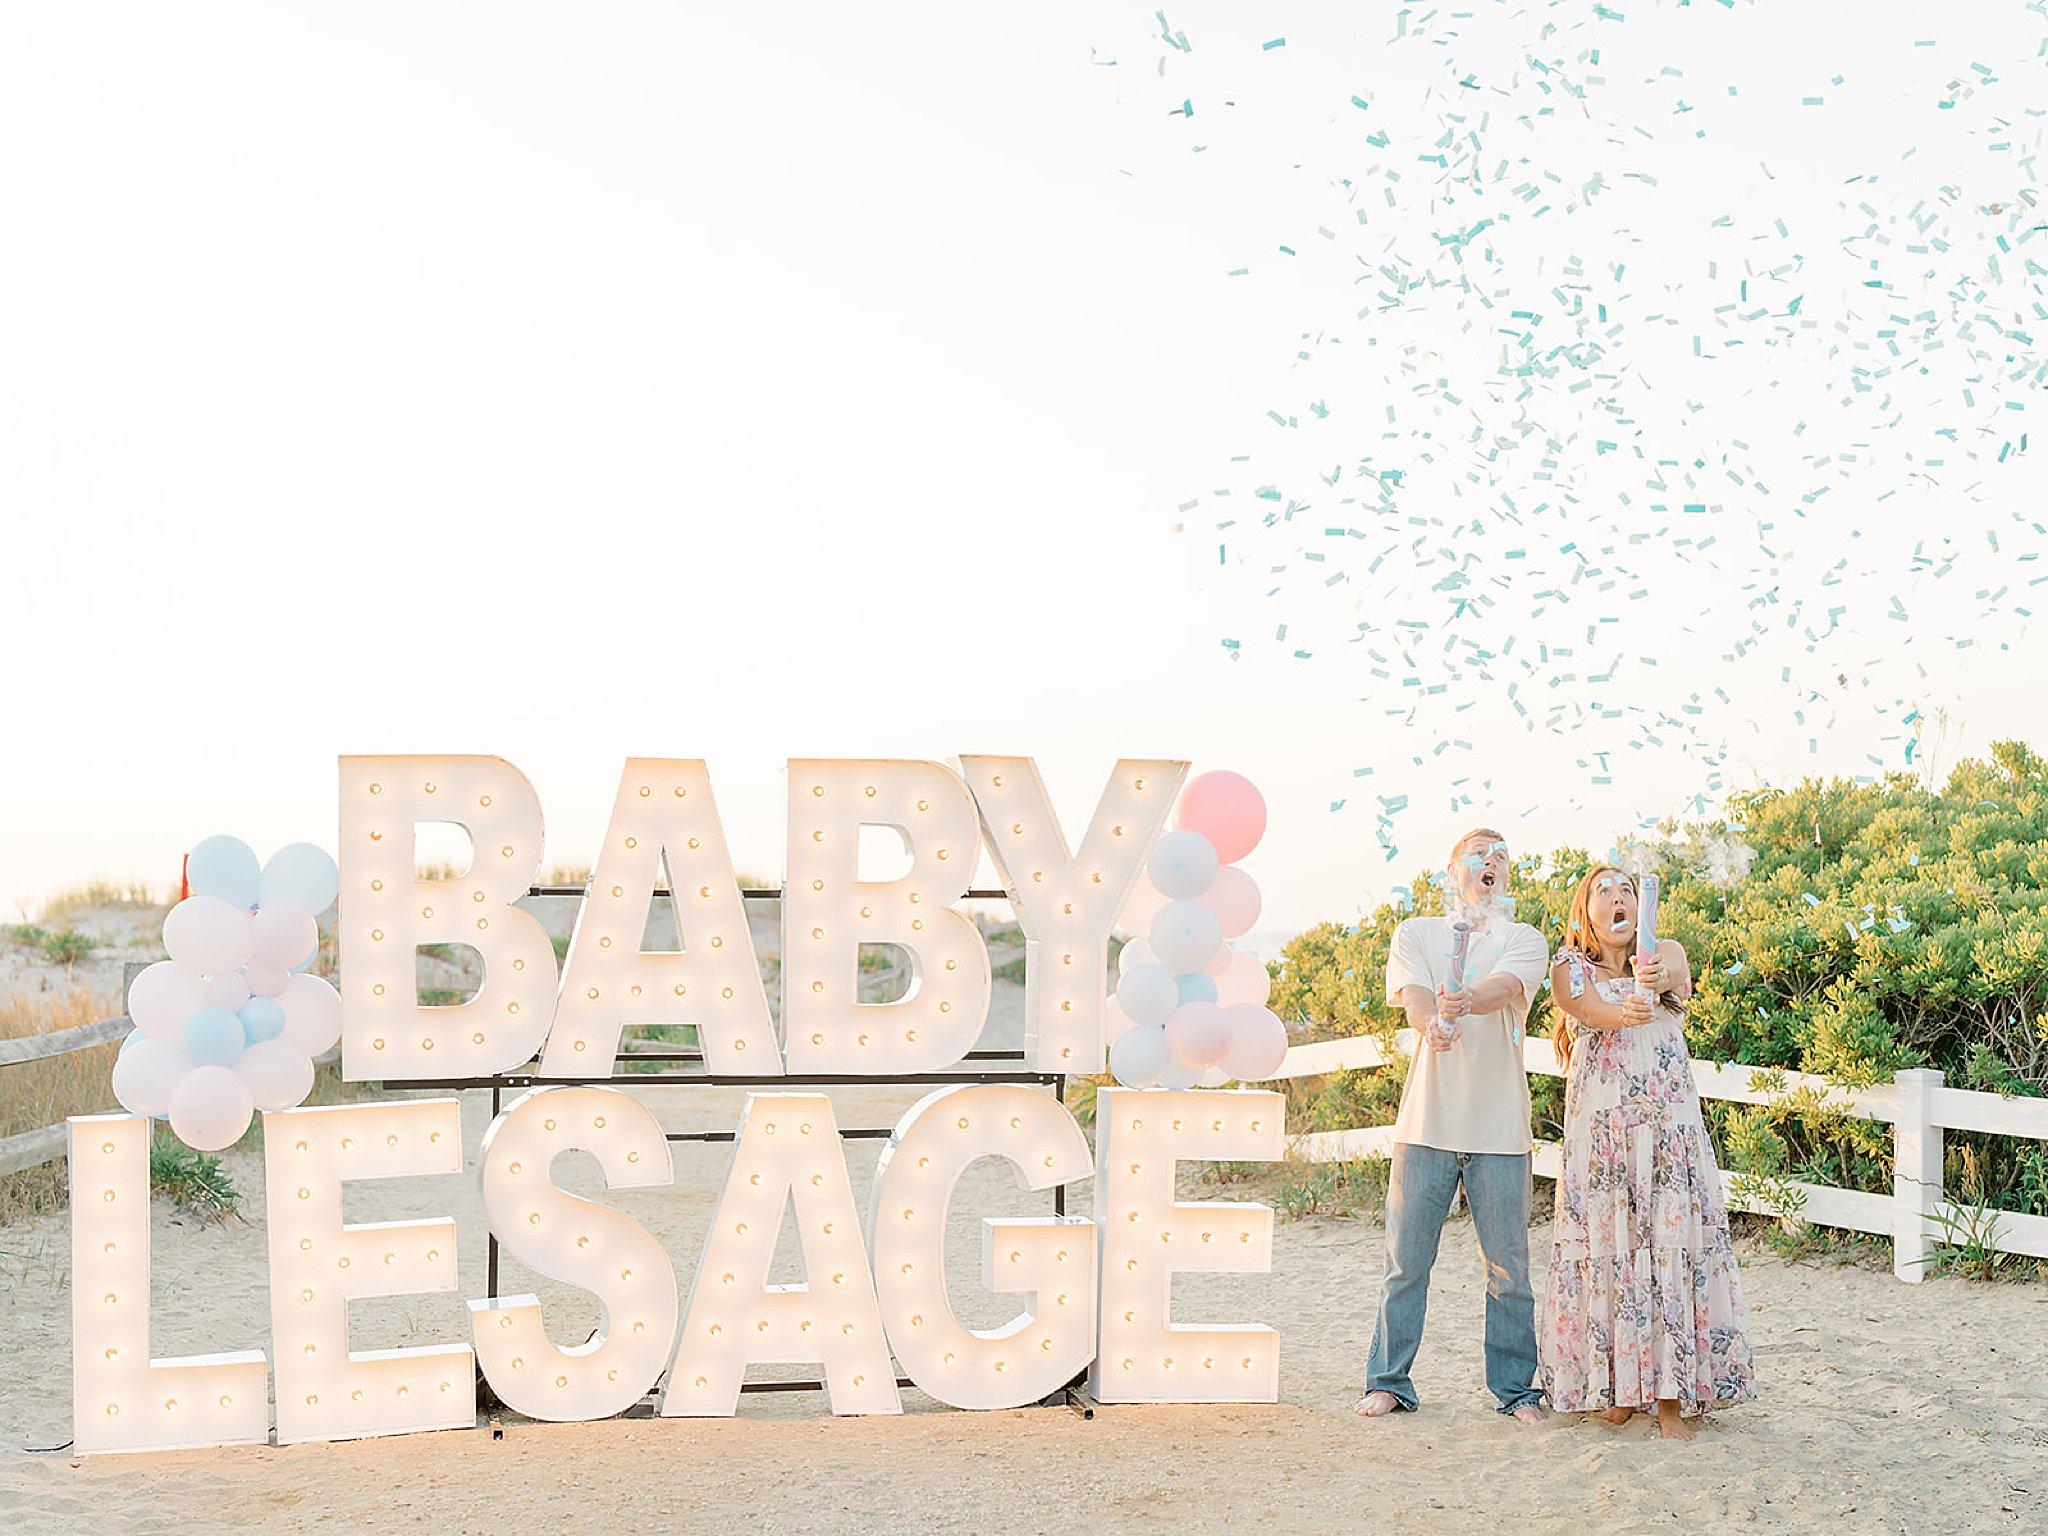 Ocean City NJ Gender Reveal Pregnancy Photography by Magdalena Studios 0006 1